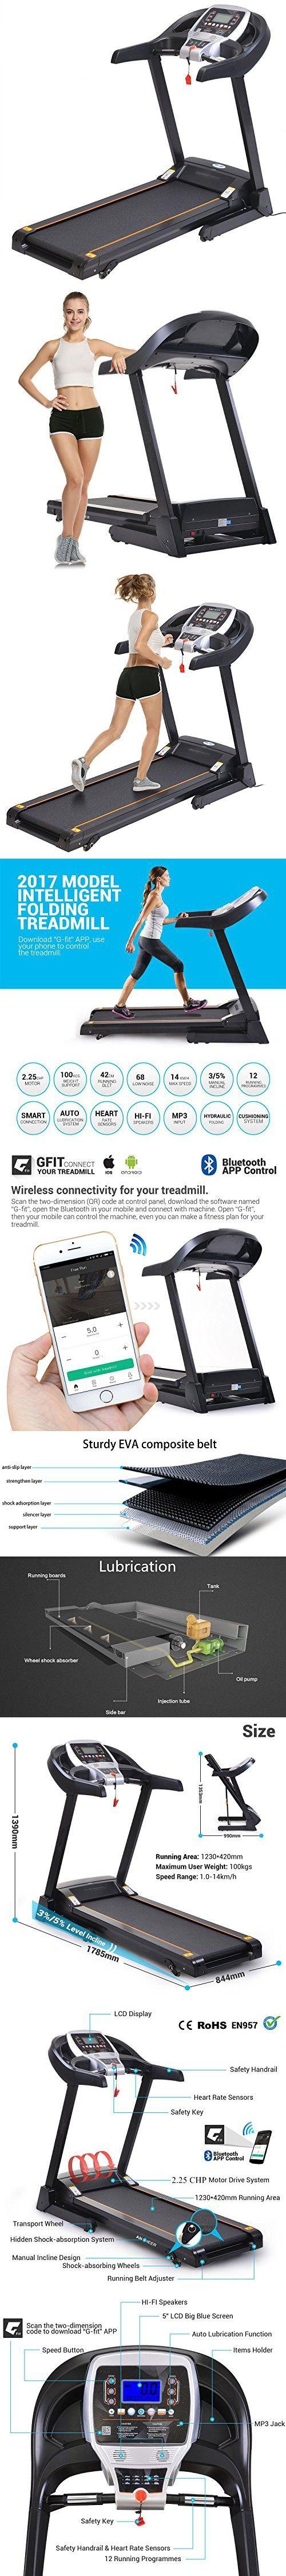 Lantusi Foldable Treadmill APP Bluetooth Control, Portable Electric Motorized Running Fitness Machine , Black & Grey (US STOCK)